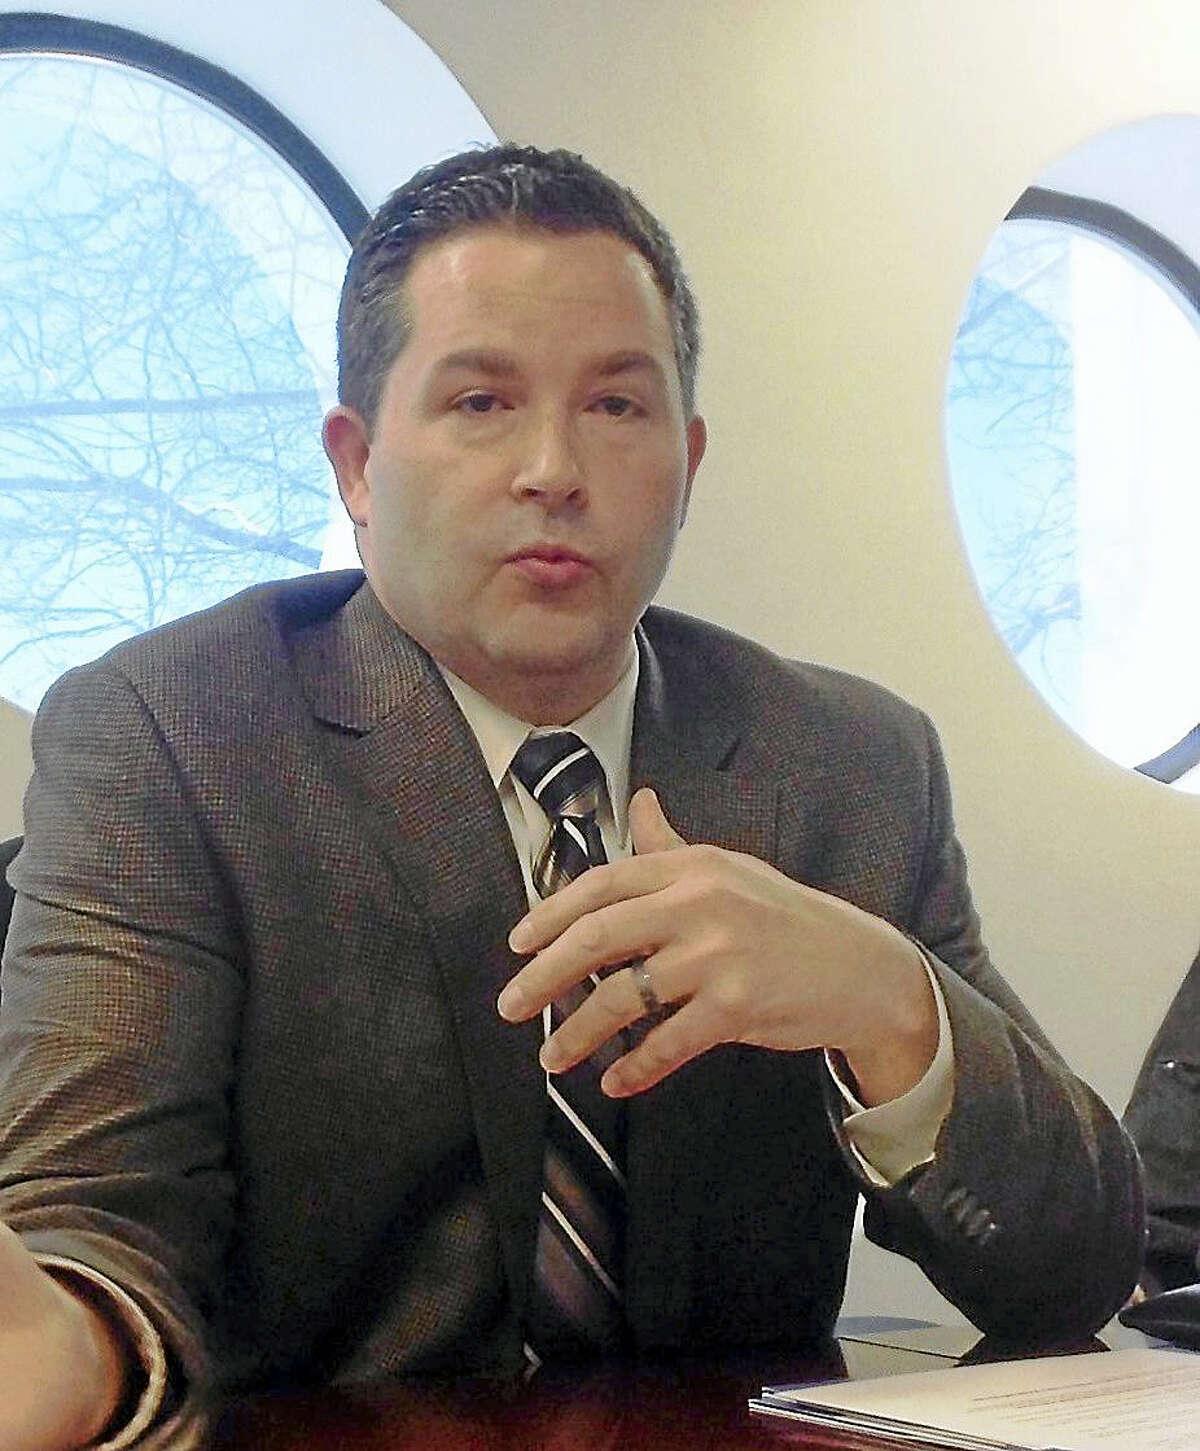 Jeffrey Villar, executive director of the Connecticut Council for Education Reform.